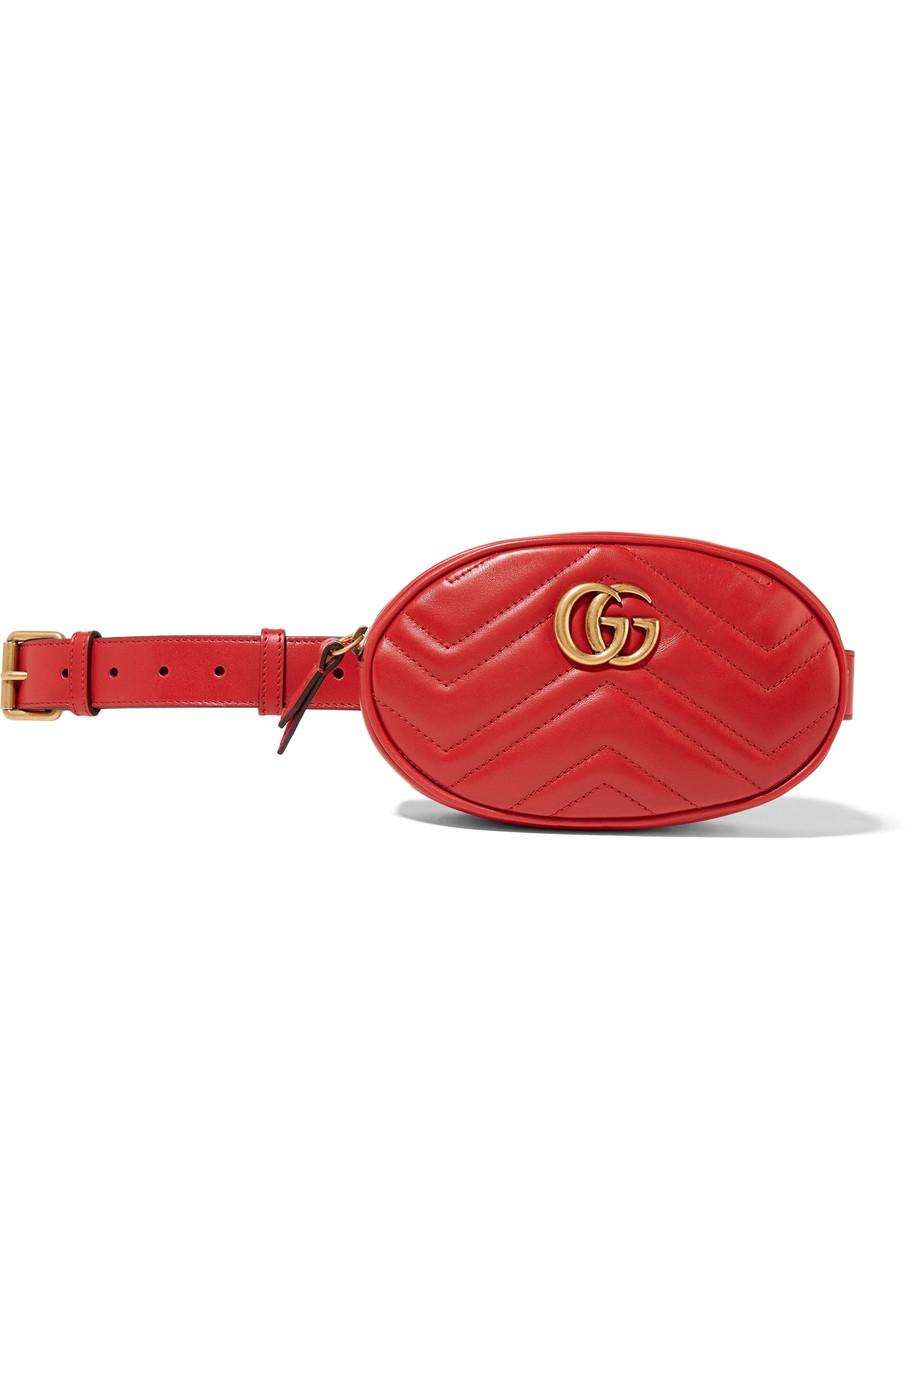 Gucci, Moda, Tendencia, Bolsa, Bandolera, Fanny Pack